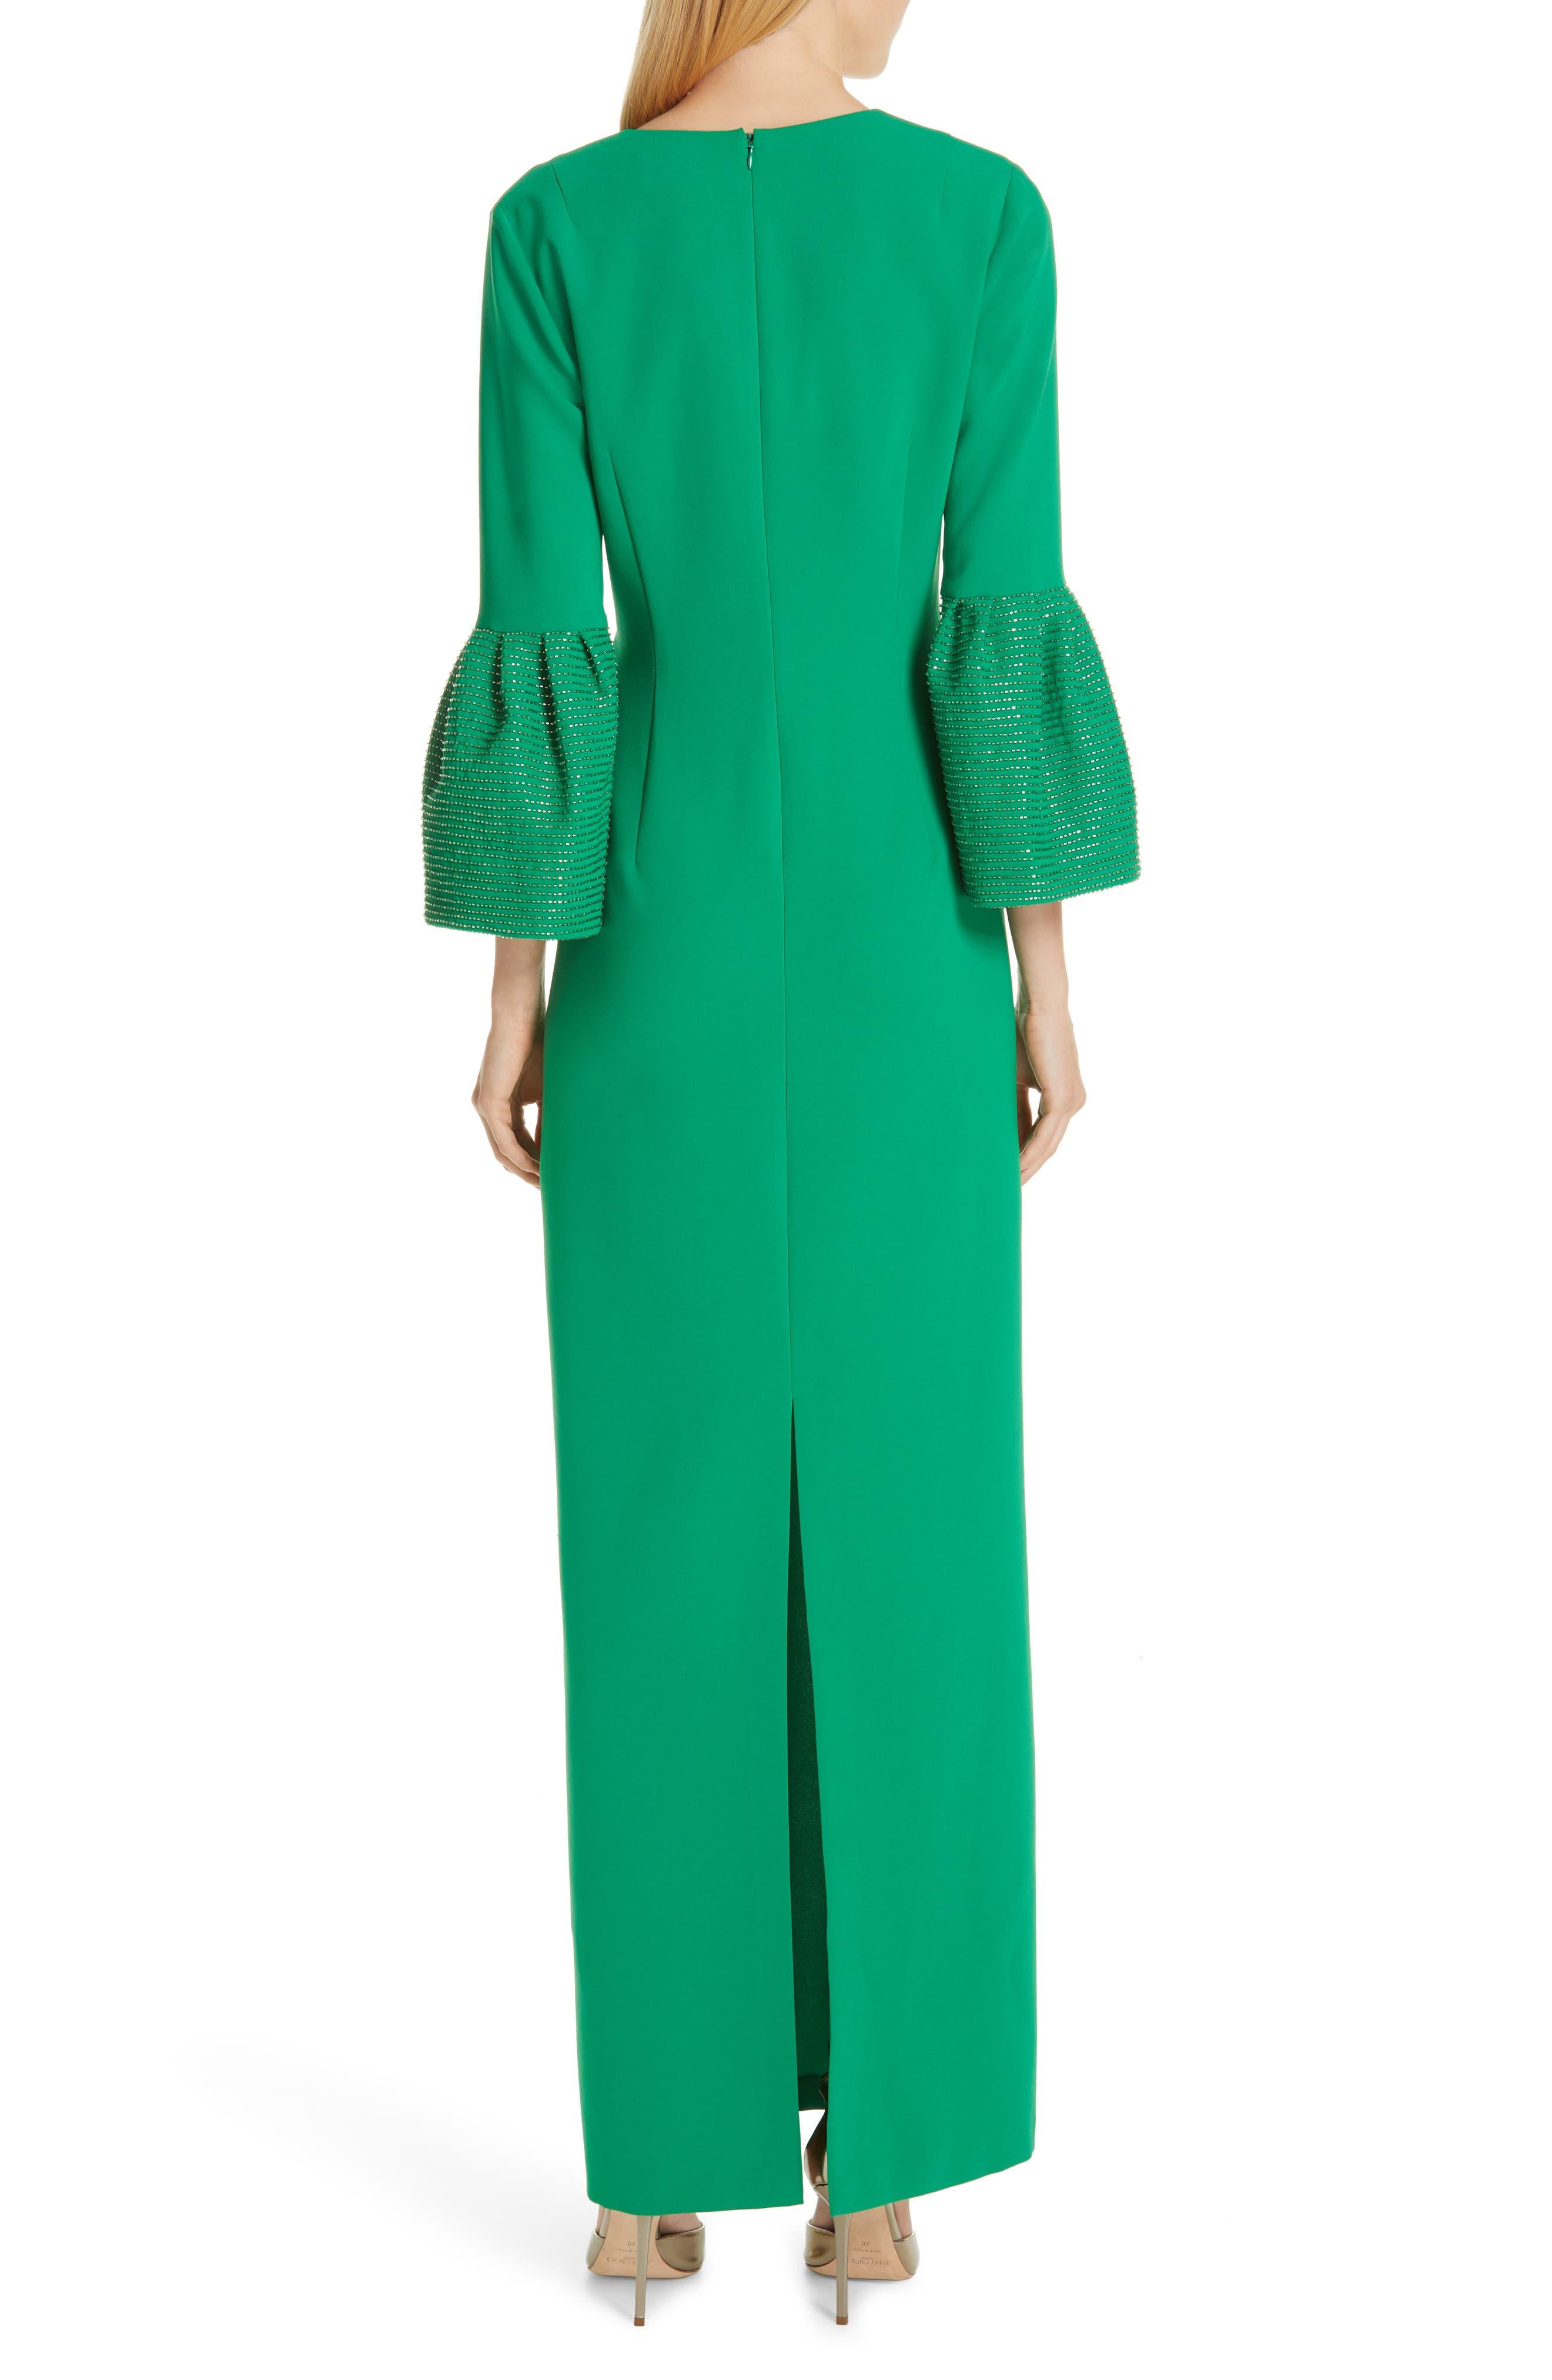 SACHIN & BABI, Tower Beaded Cuff Column Evening Dress, Alternate thumbnail 2, color, TOWER GREEN